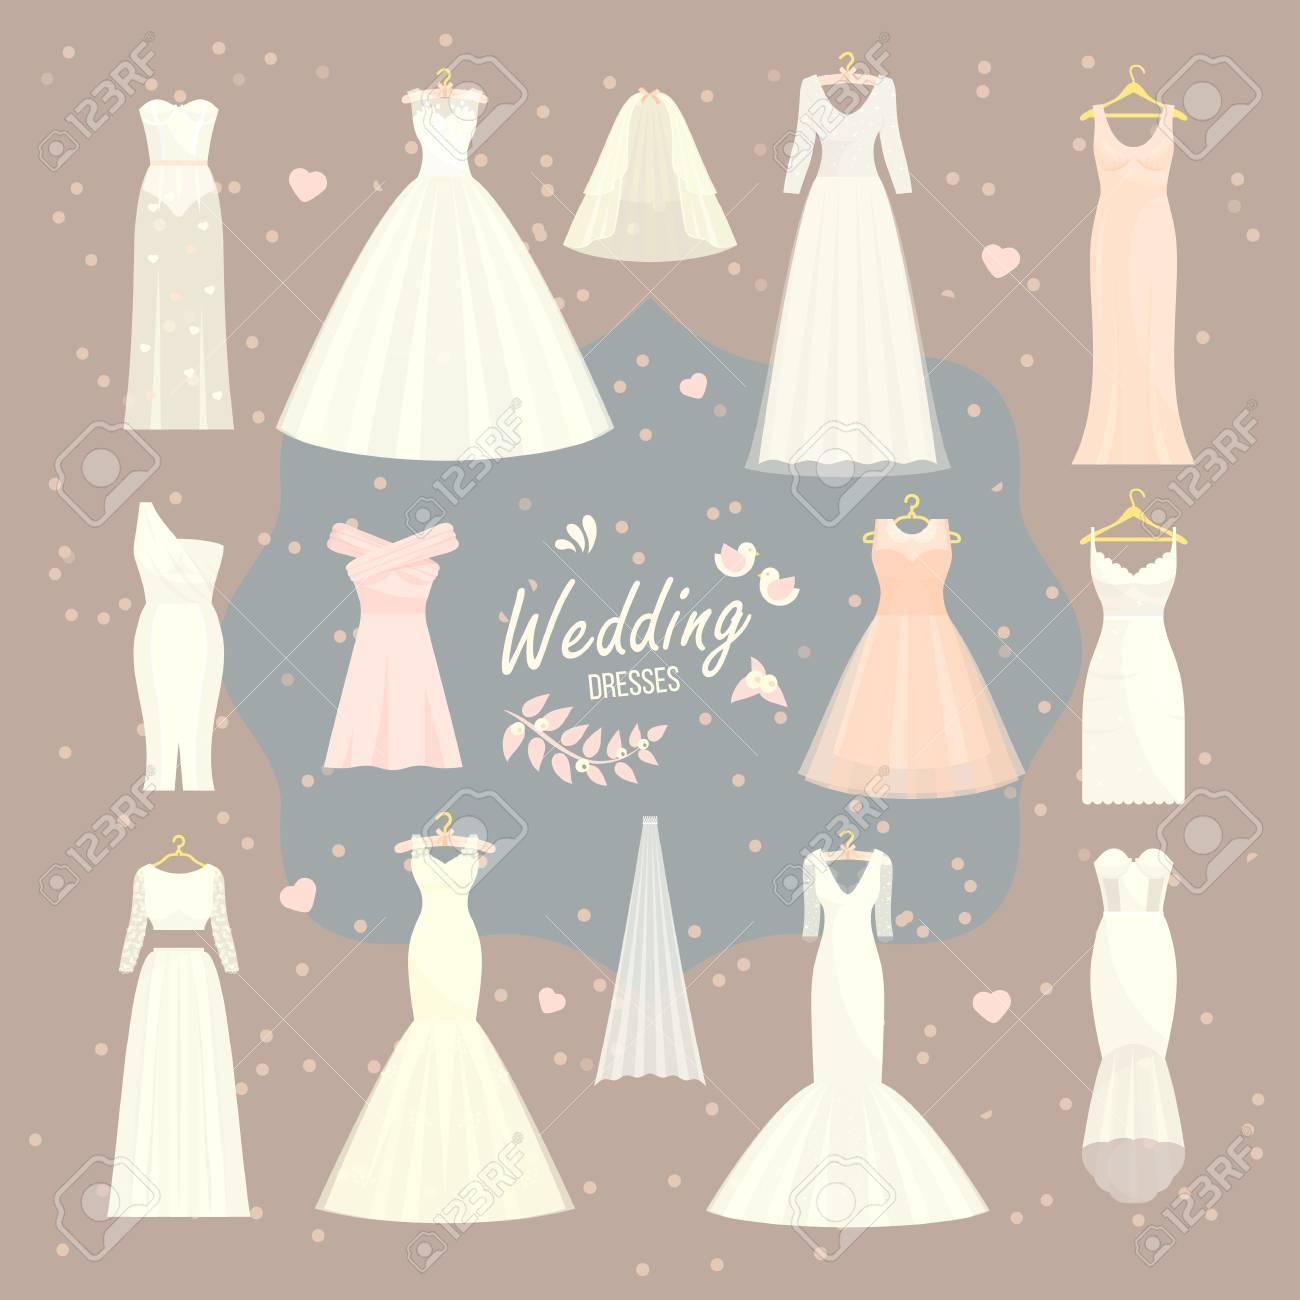 Wedding Dress Accessories.Stock Illustration